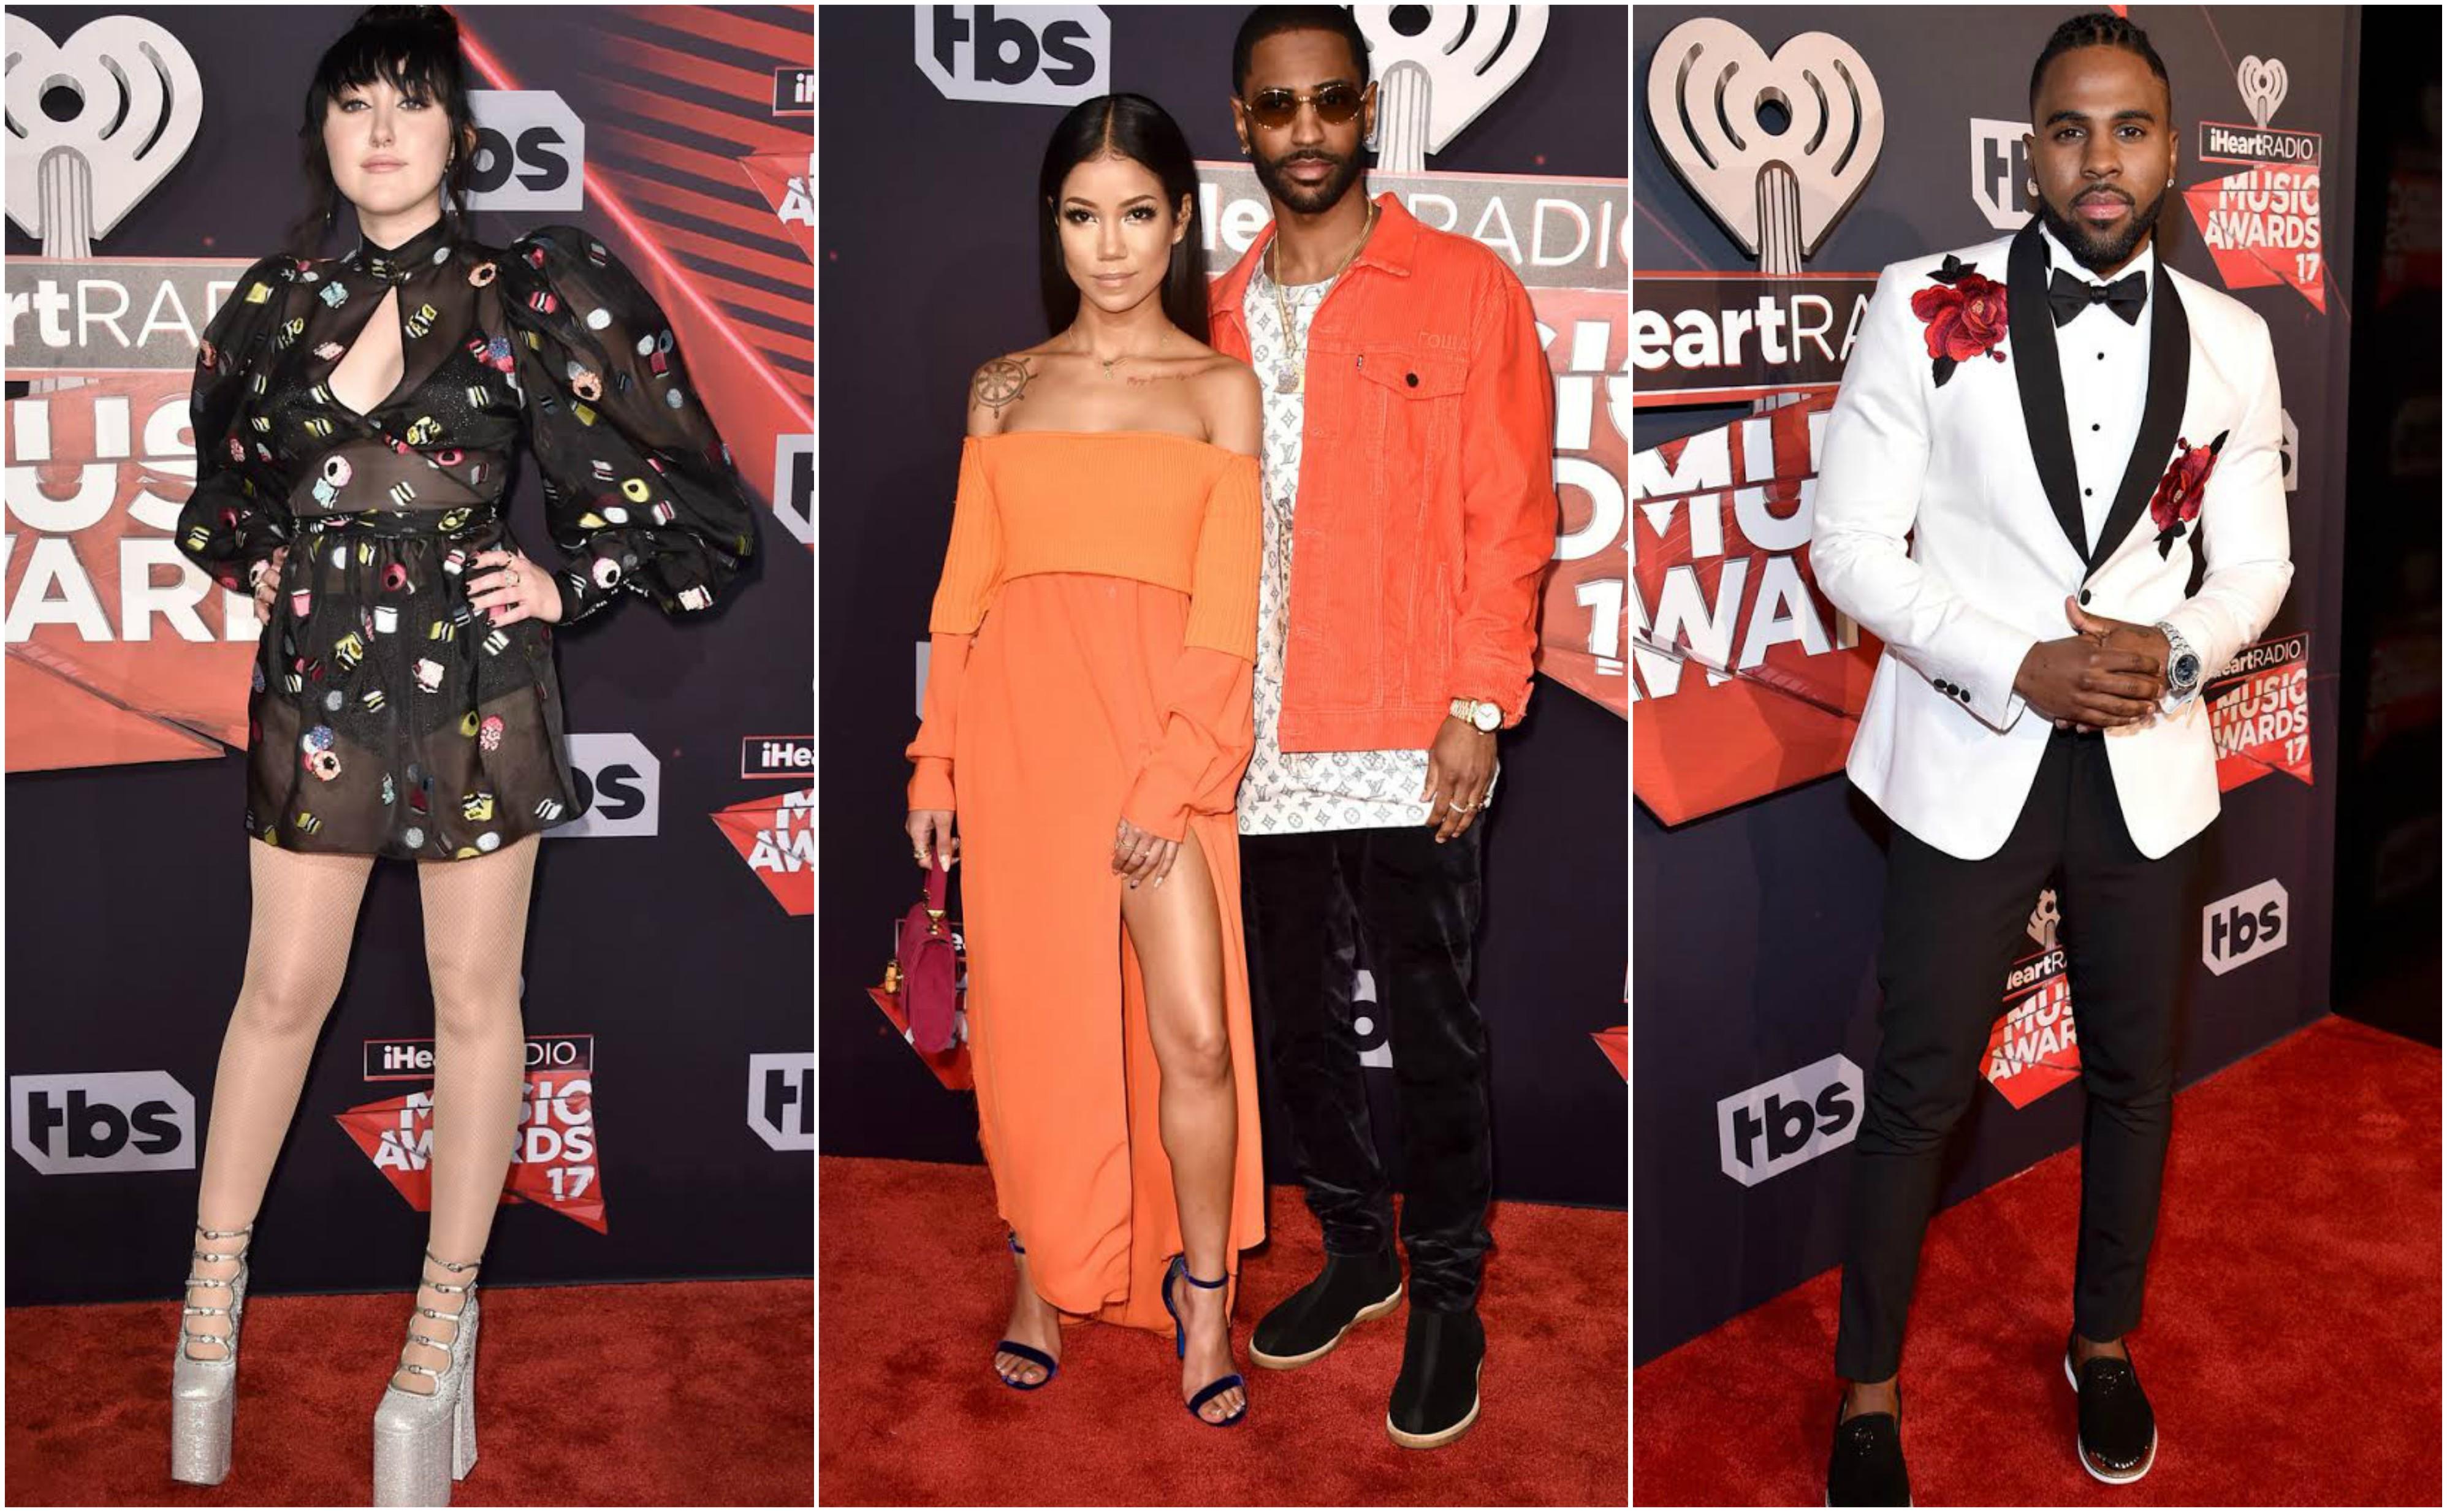 iHeartRadio Awards: Best & Worst Dressed